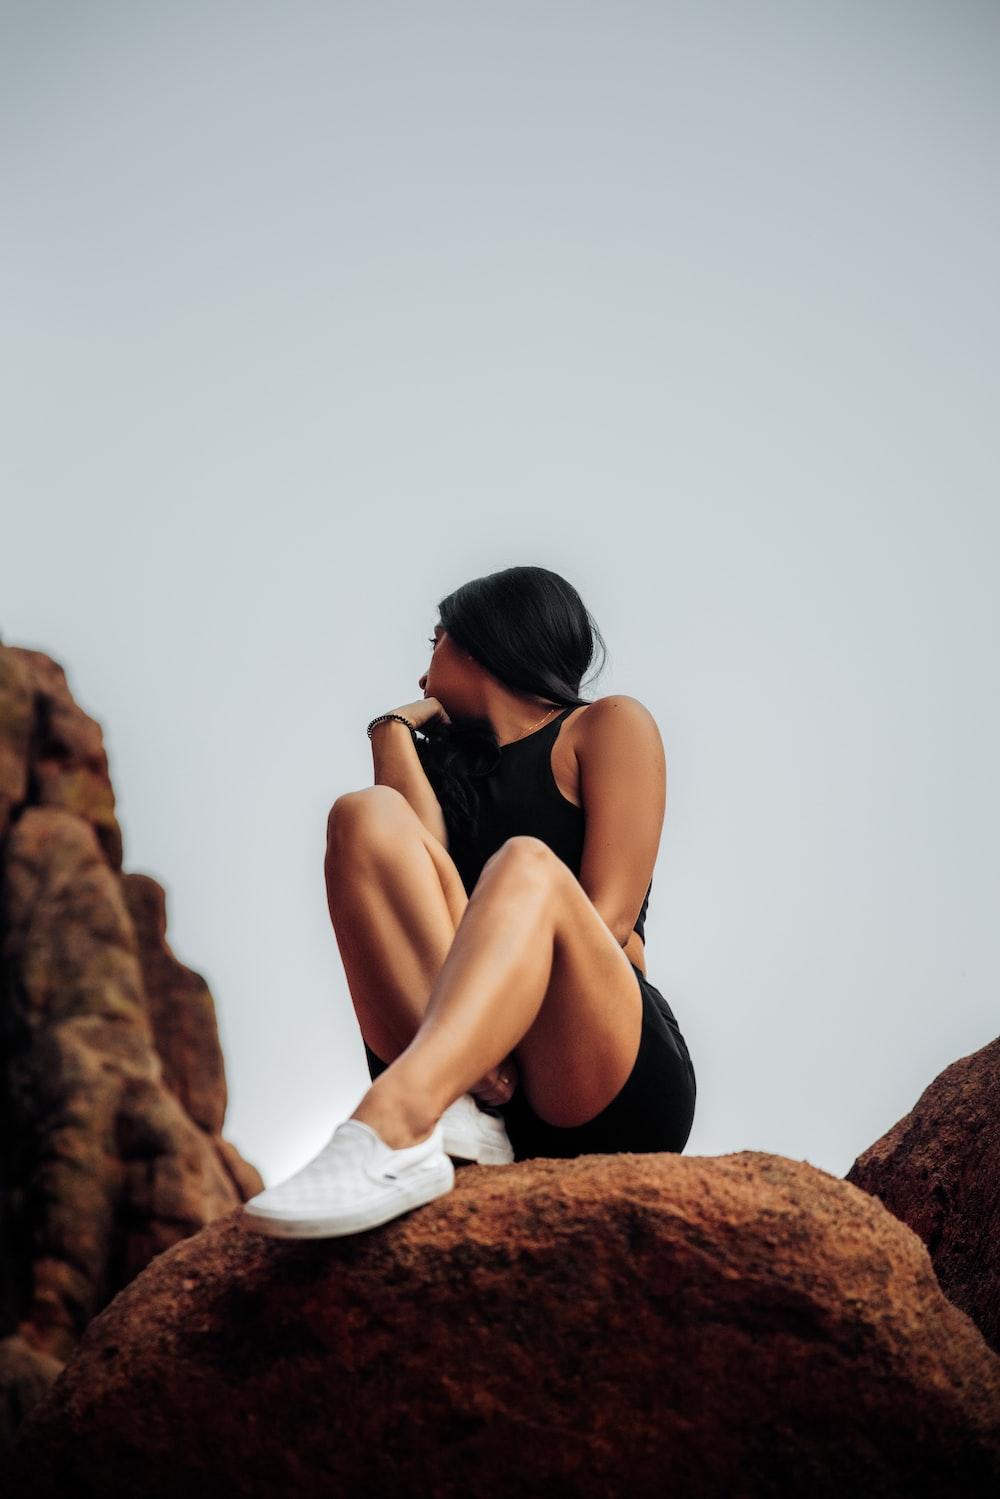 woman in black bikini sitting on brown rock during daytime